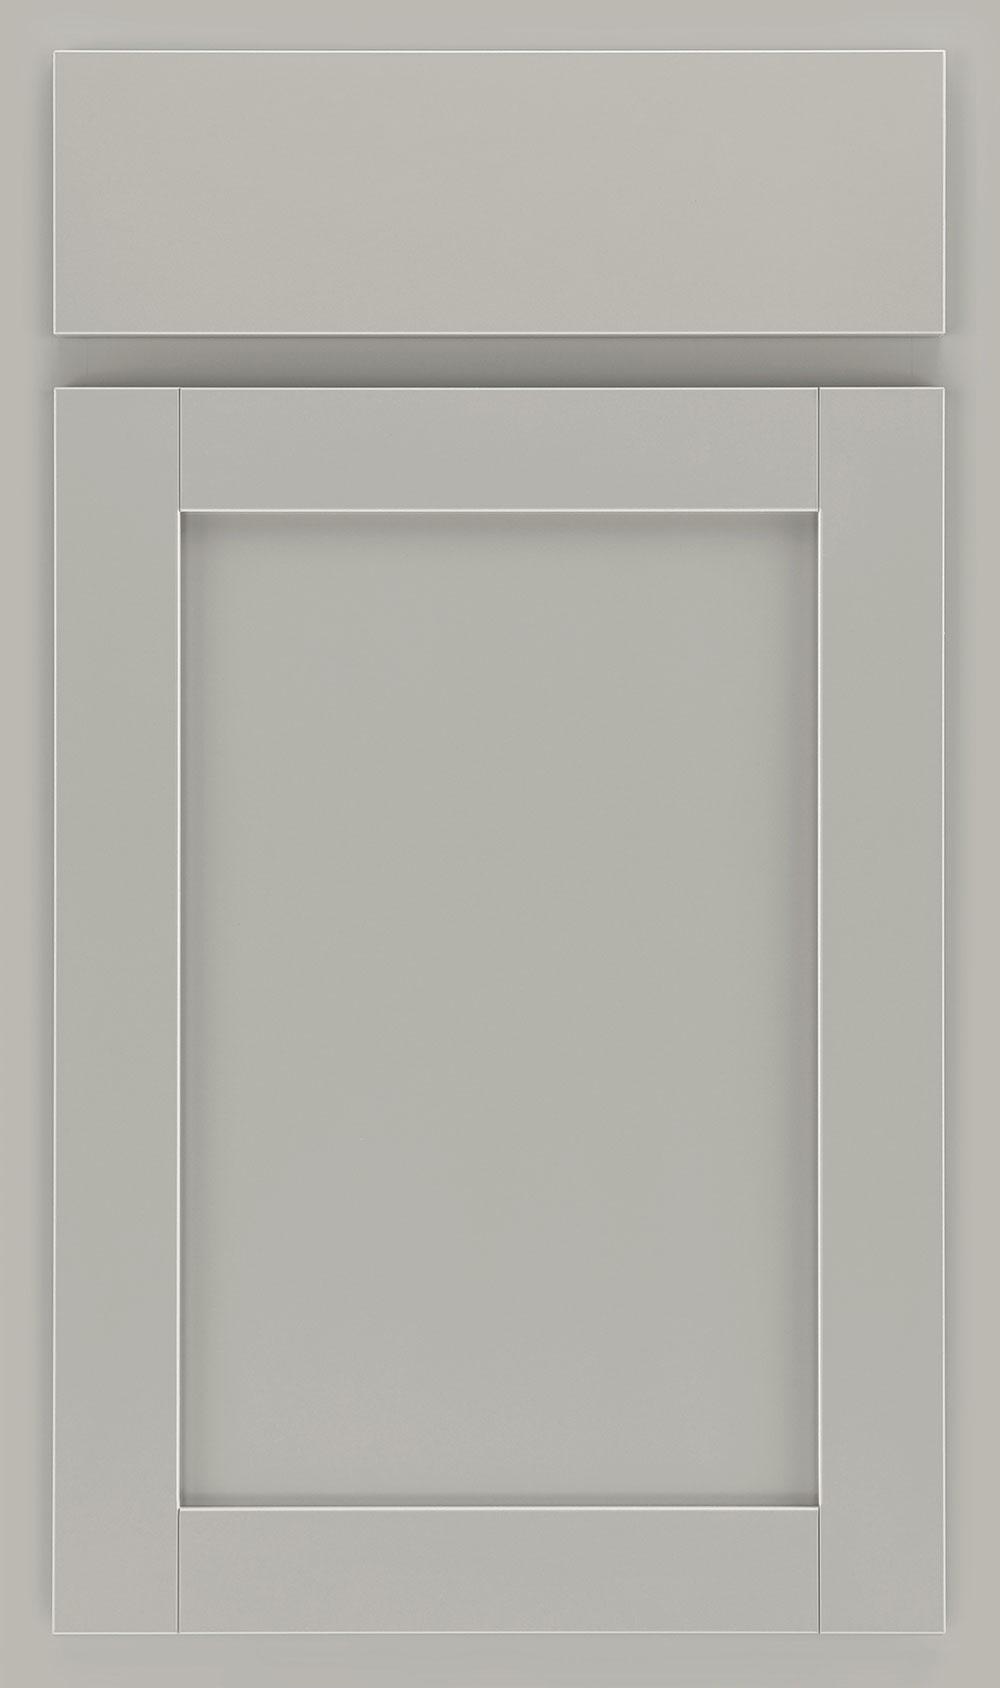 San Mateo Collection American Woodmark Cabinets